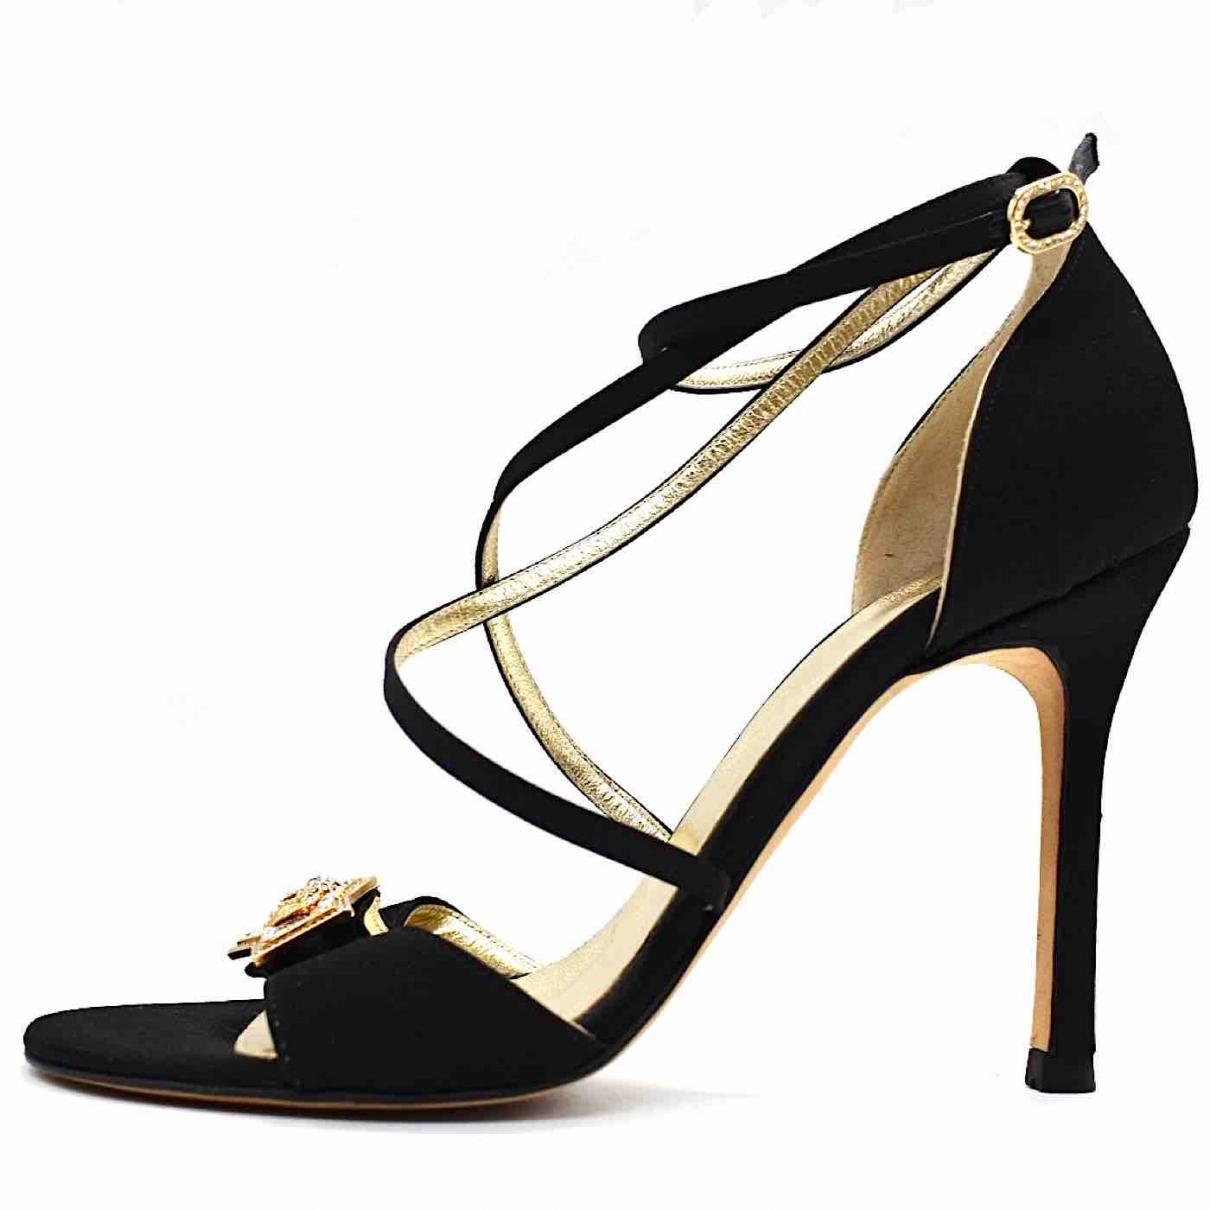 Versace \N Black Leather Sandals for Women 36.5 EU